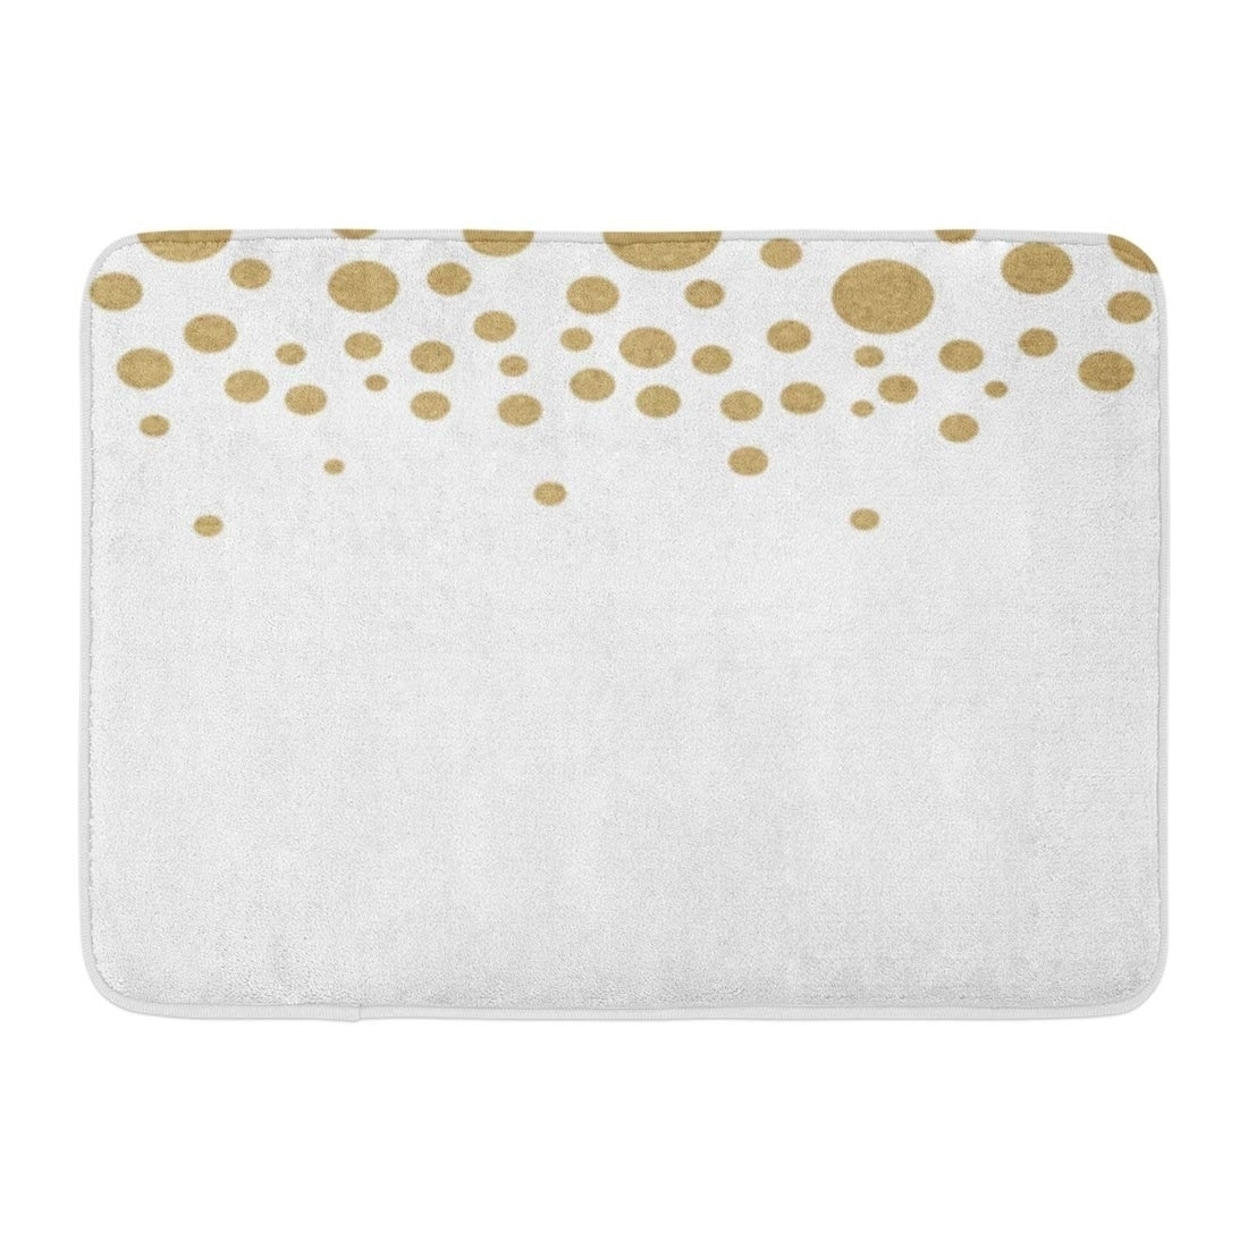 Brown Abstract Gold Circle Polka Dots Yellow Bronze Rough Light Doormat Floor Rug Bath Mat 23 6x15 7 Inch Multi On Sale Overstock 31773123